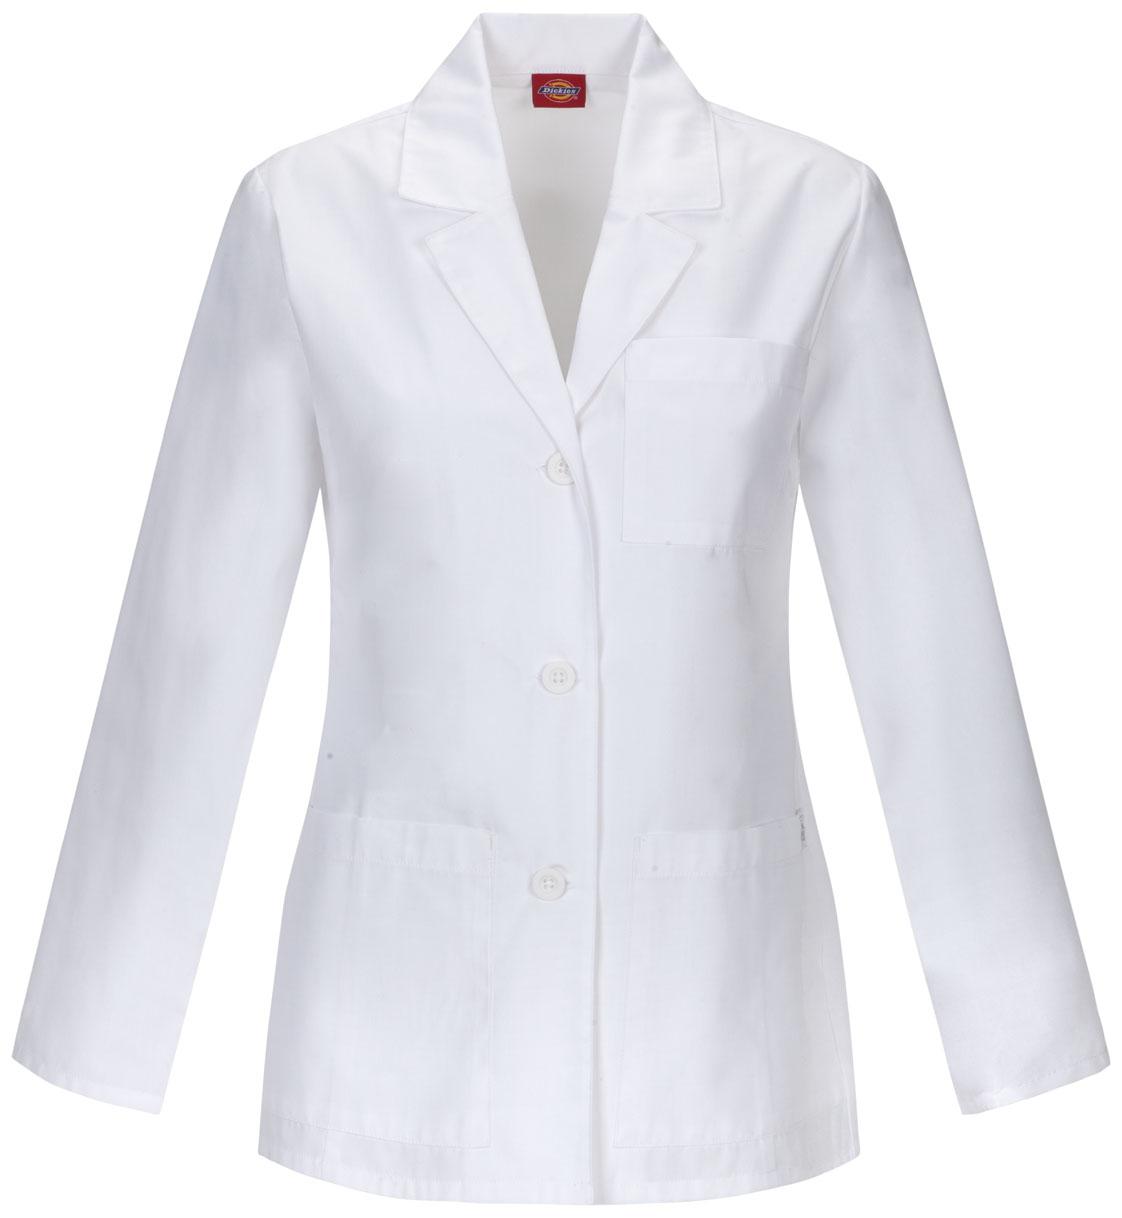 "Dickies EDS Professional Whites w/ Certainty Plus 28"" Lab Coat-"